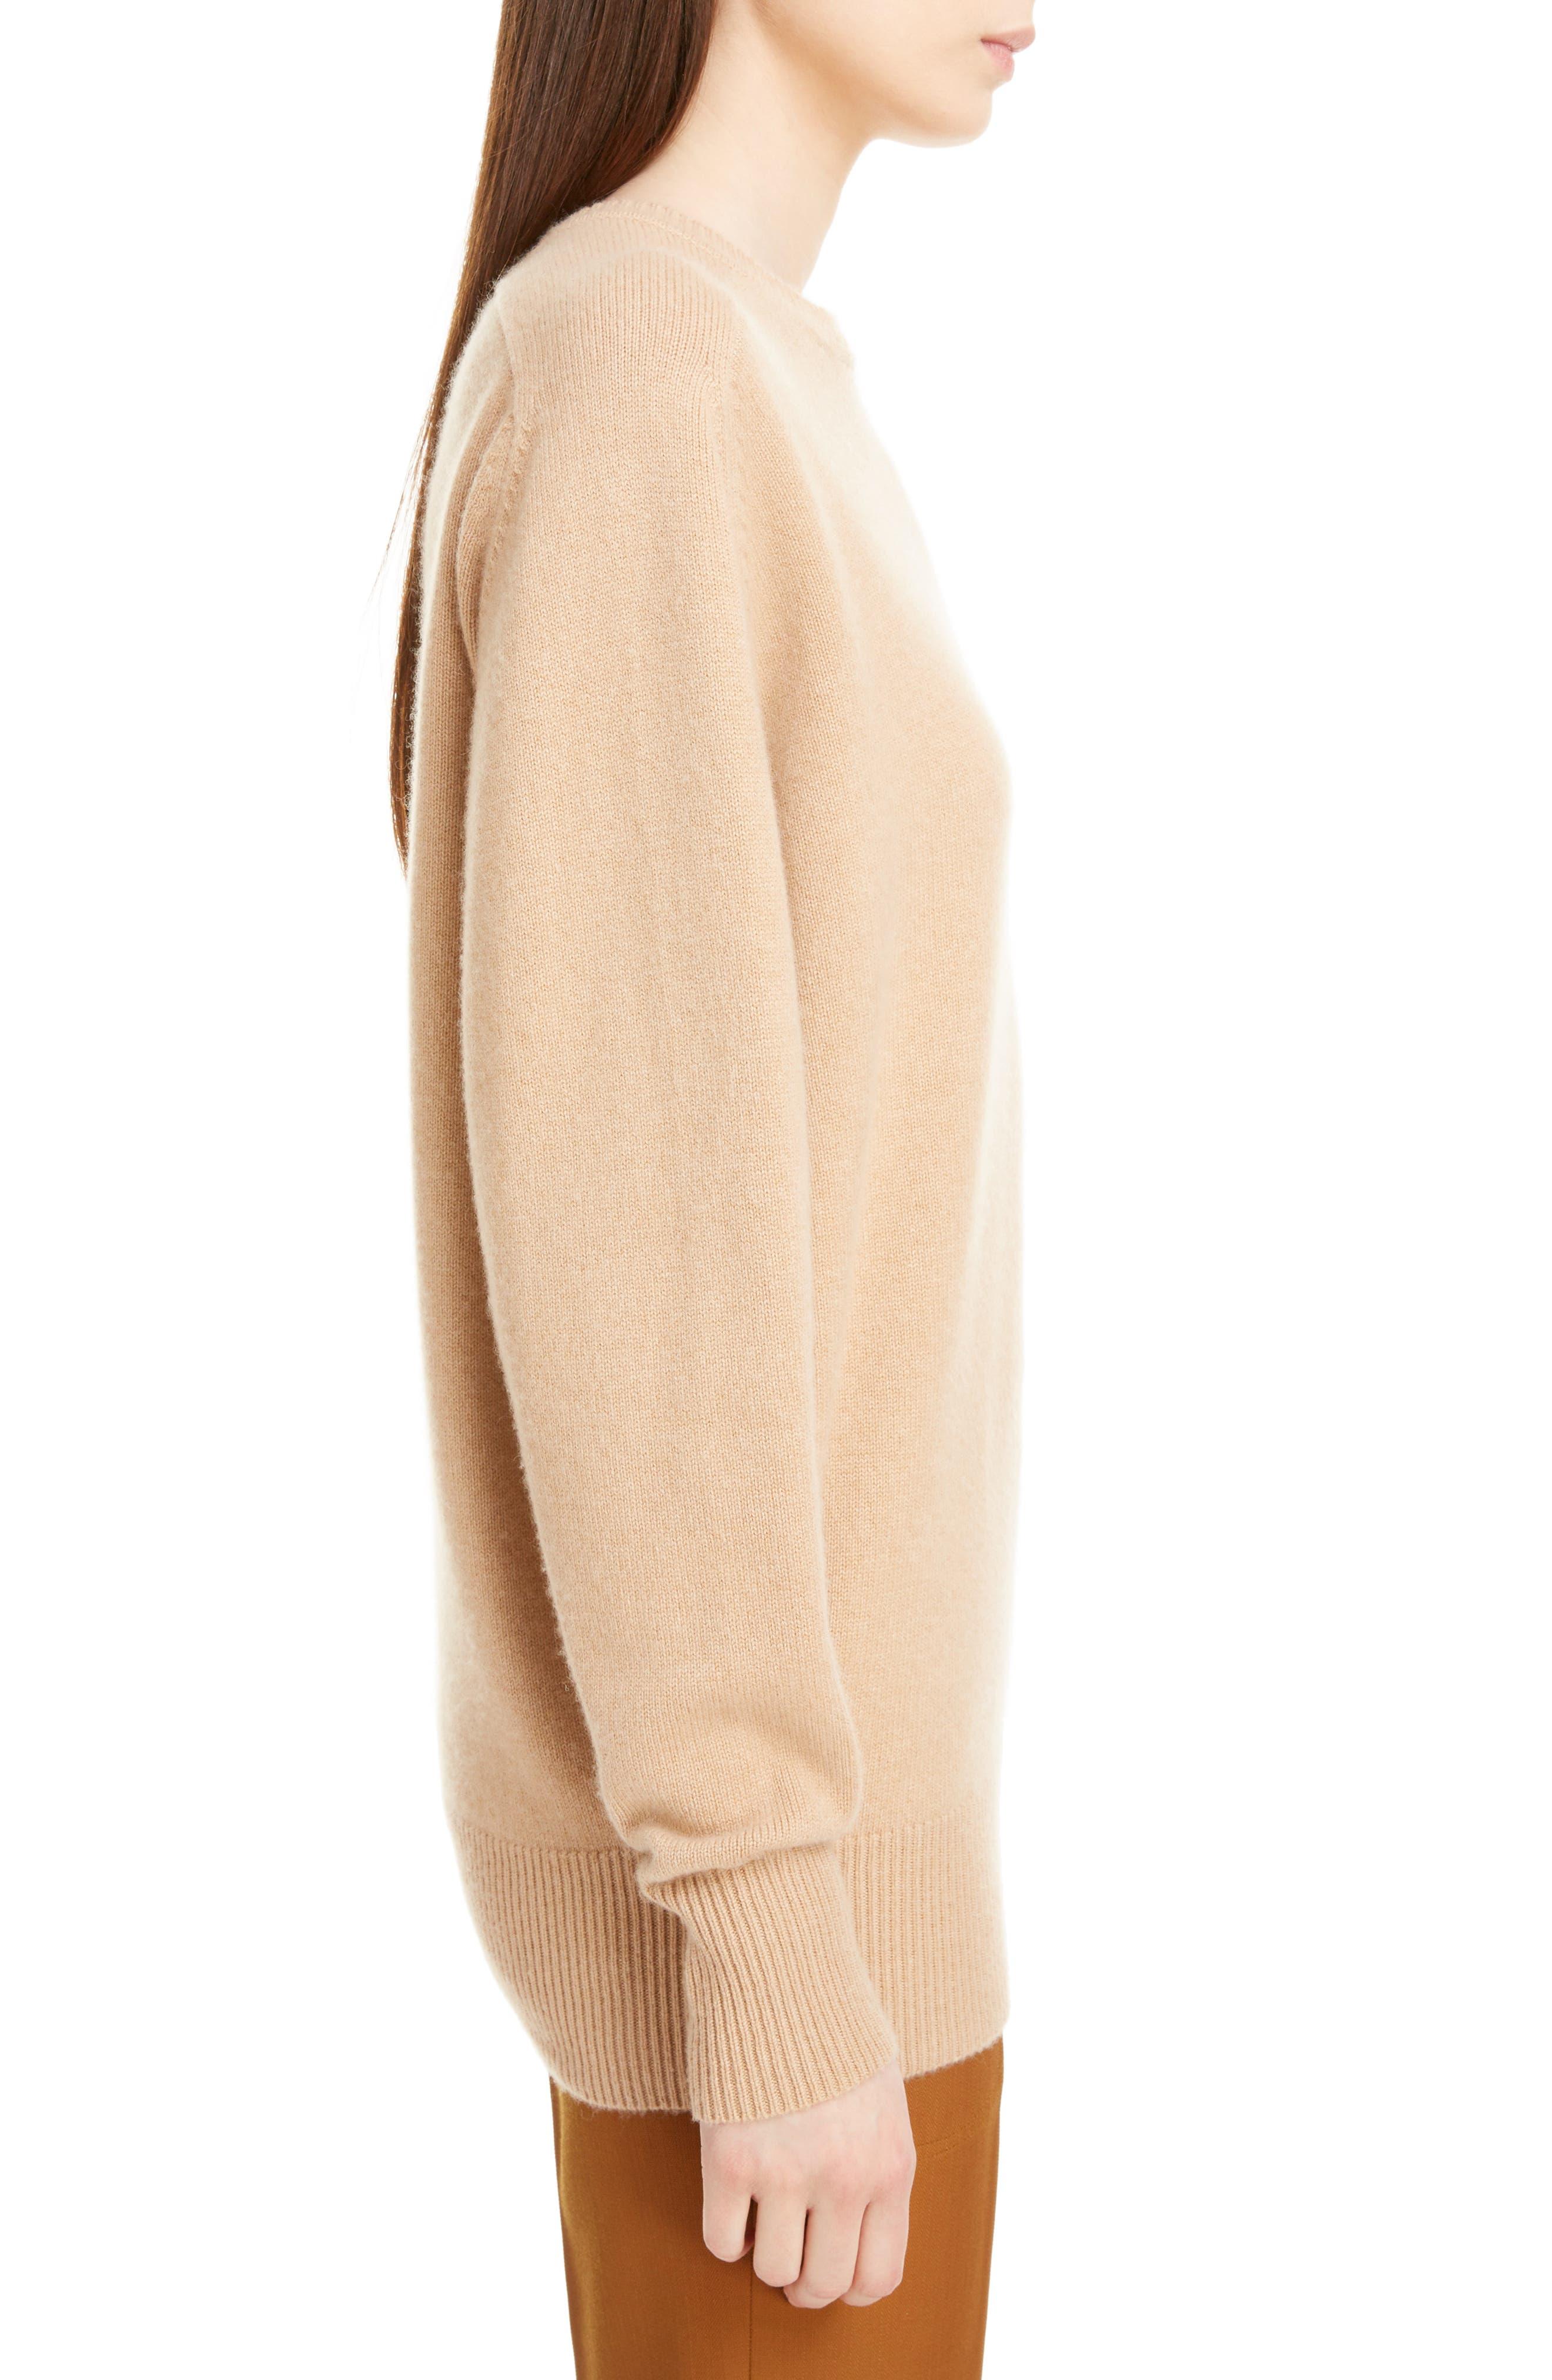 VICTORIA BECKHAM, Cashmere Blend Sweater, Alternate thumbnail 3, color, LIGHT CAMEL